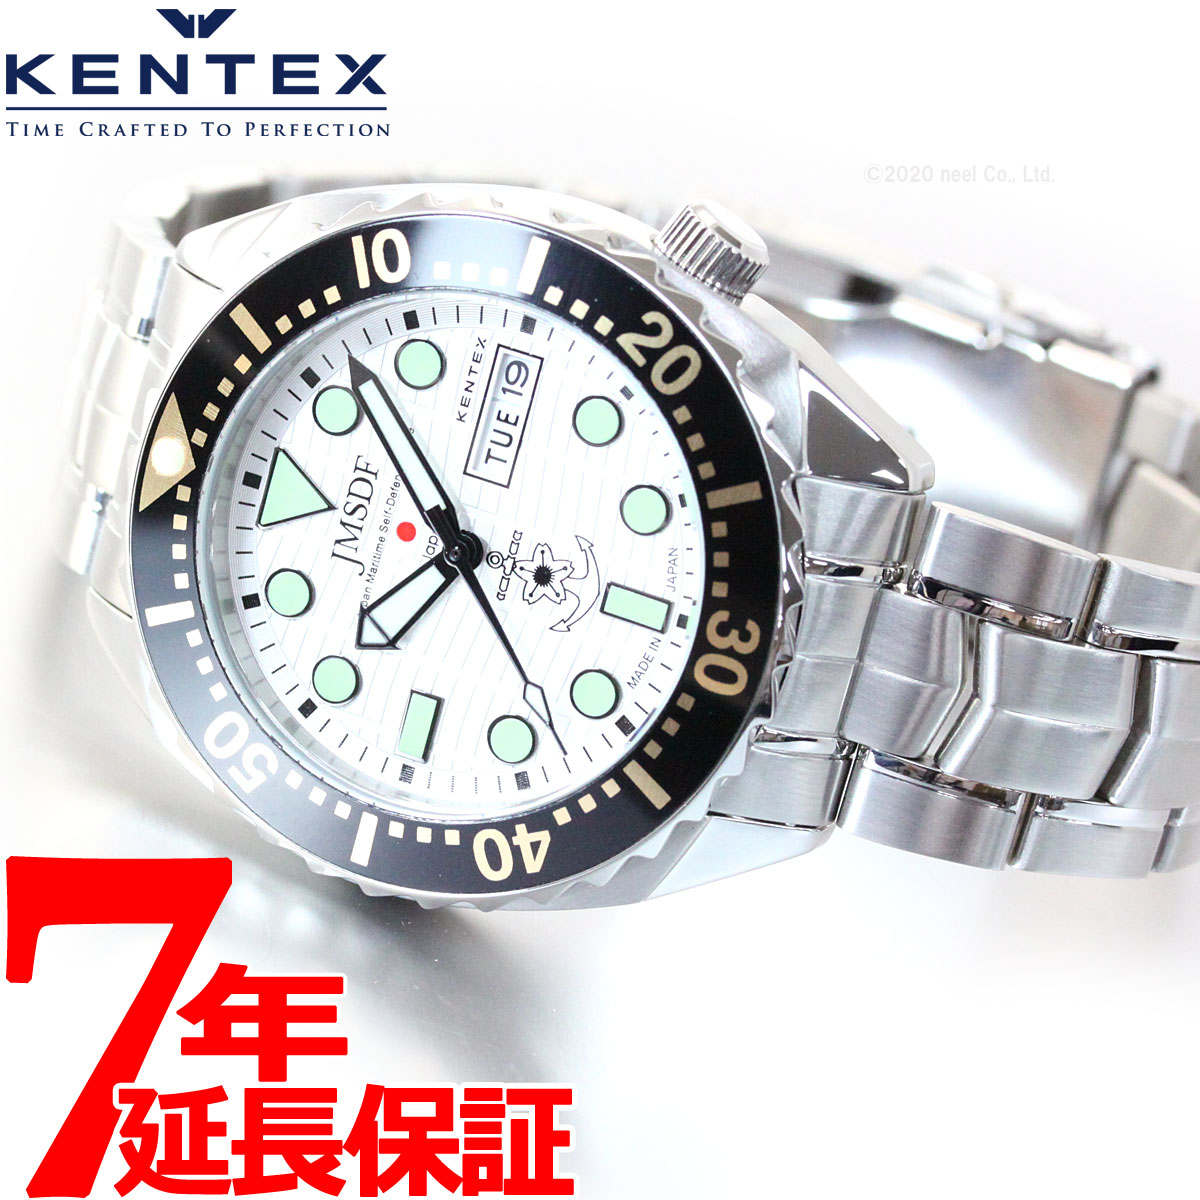 KENTEX ケンテックス 腕時計 メンズ JMSDF PRO 自衛隊モデル 海上自衛隊 ダイバーズウォッチ S649M-01